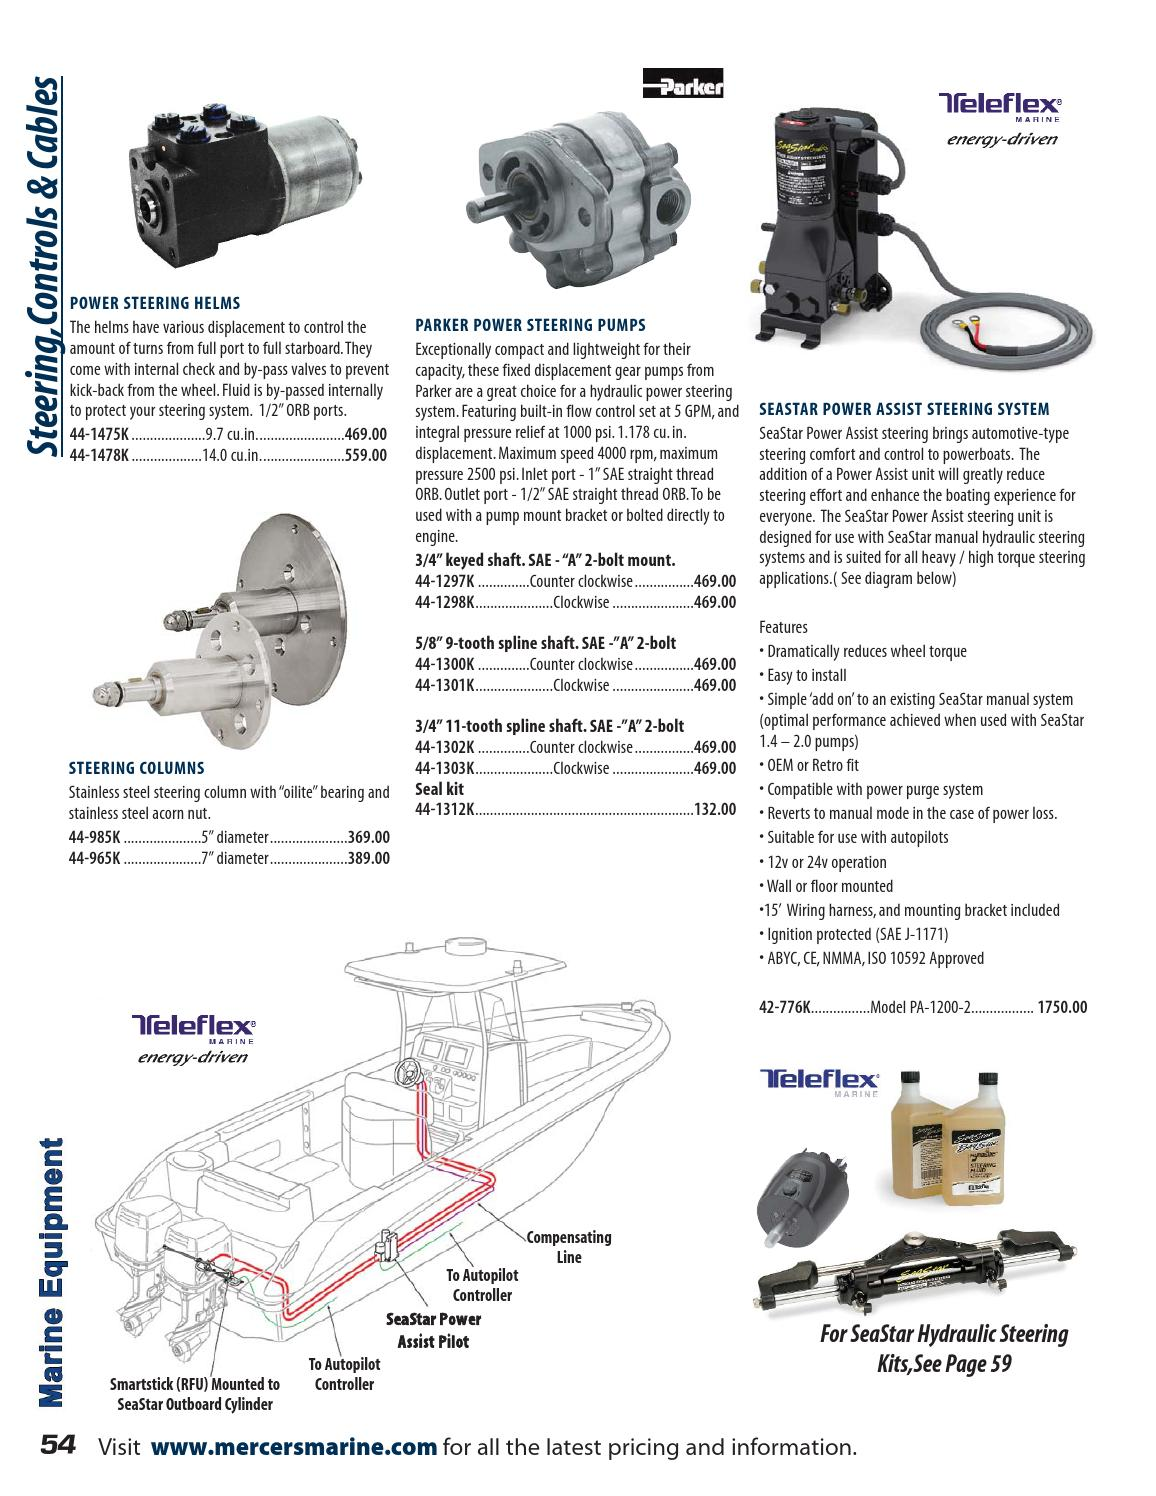 2013 2014 catalogue pdf by Mercer's Marine - issuu